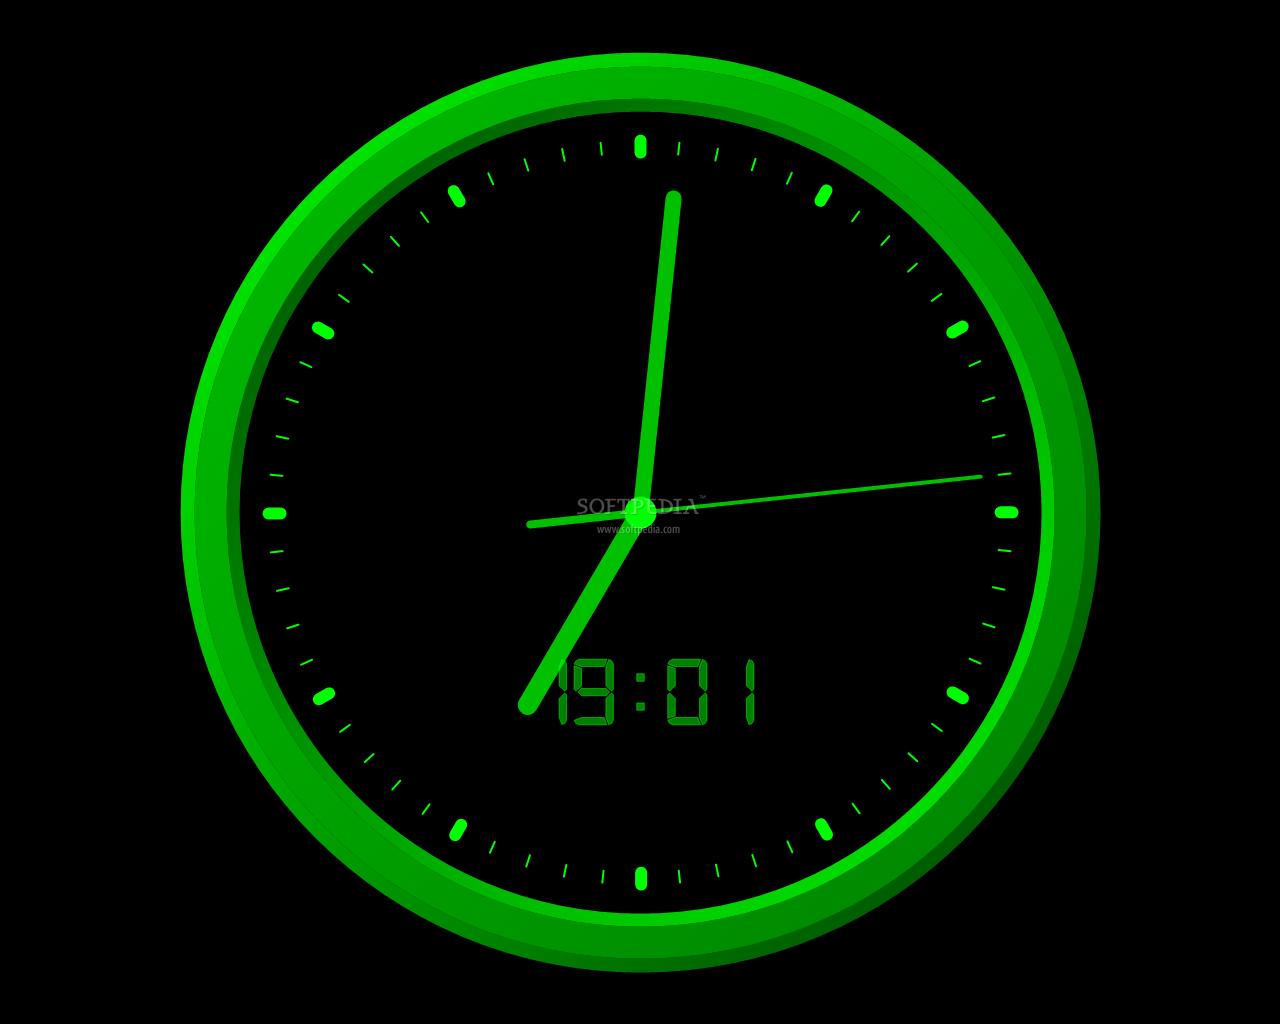 ���� ���� ������ Analog Clock-7 2.01